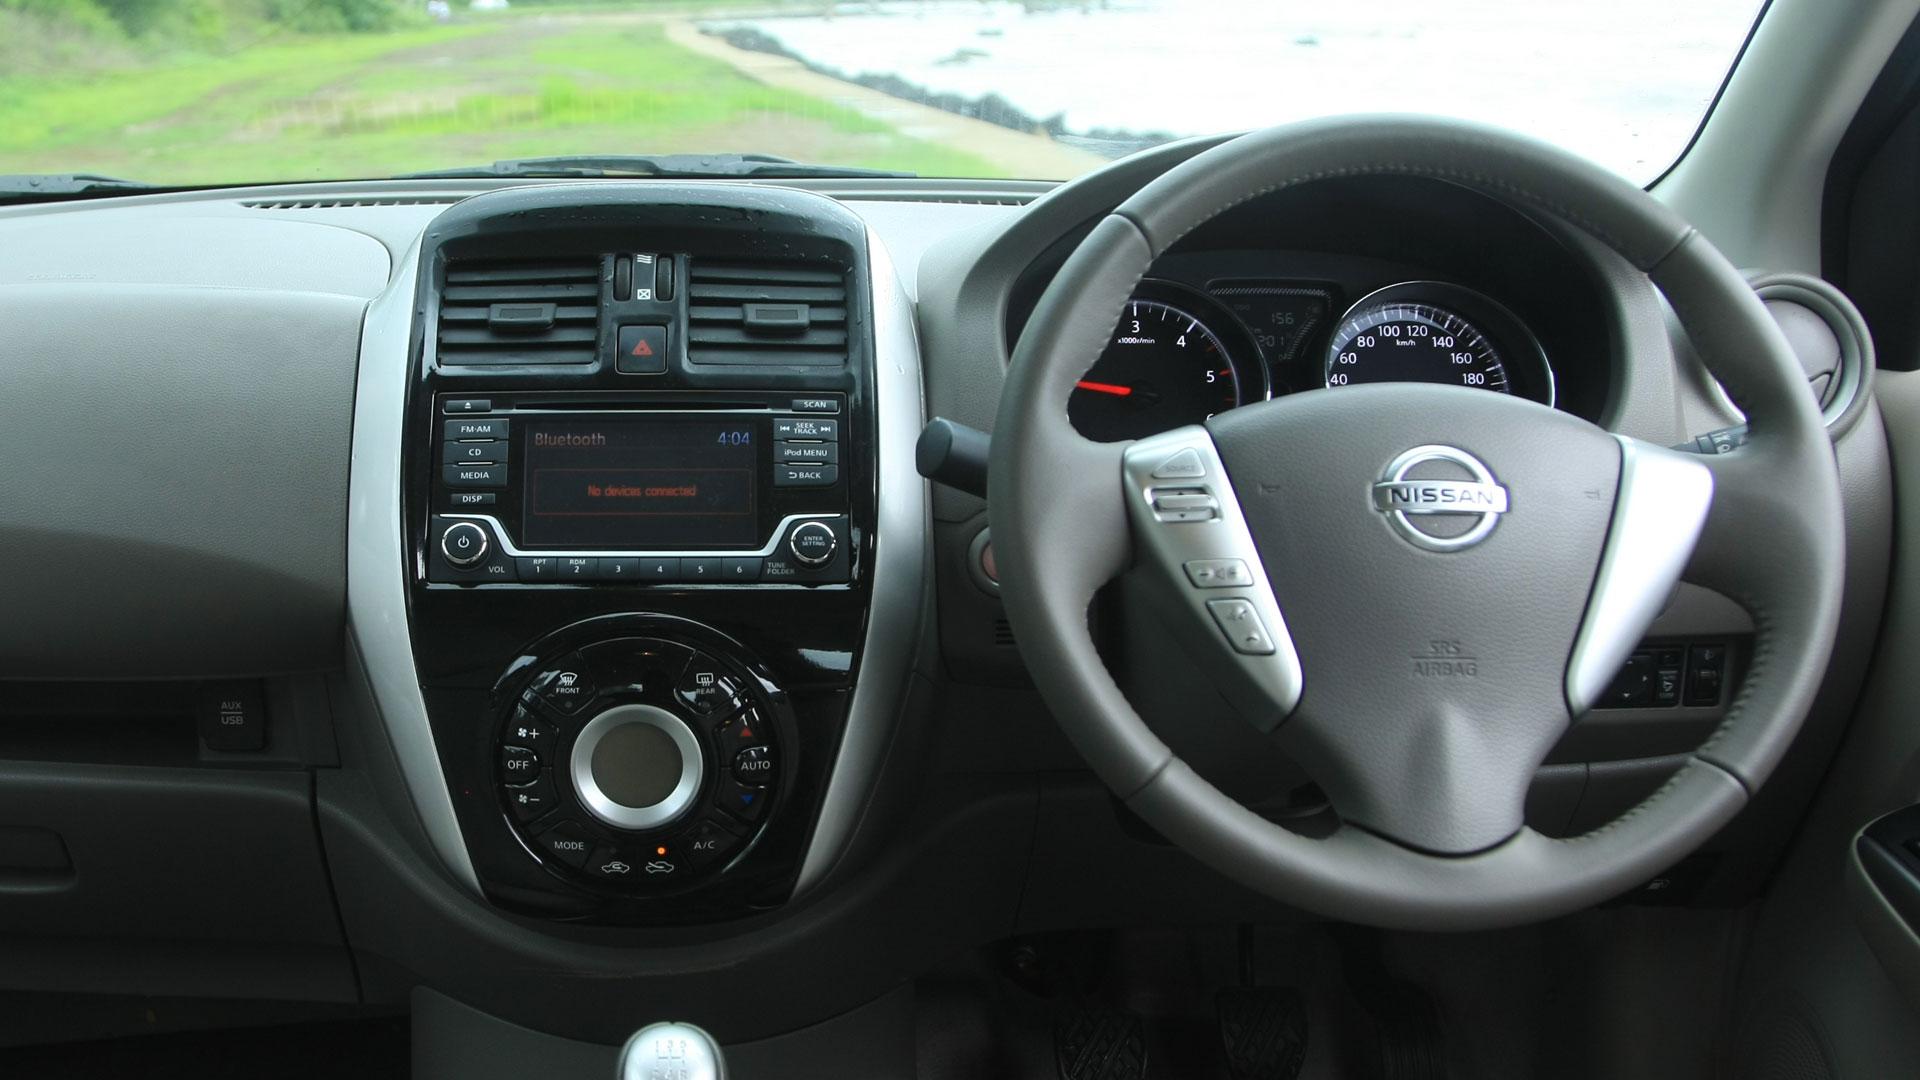 Nissan Sunny 2017 XL Petrol - Price, Mileage, Reviews ...